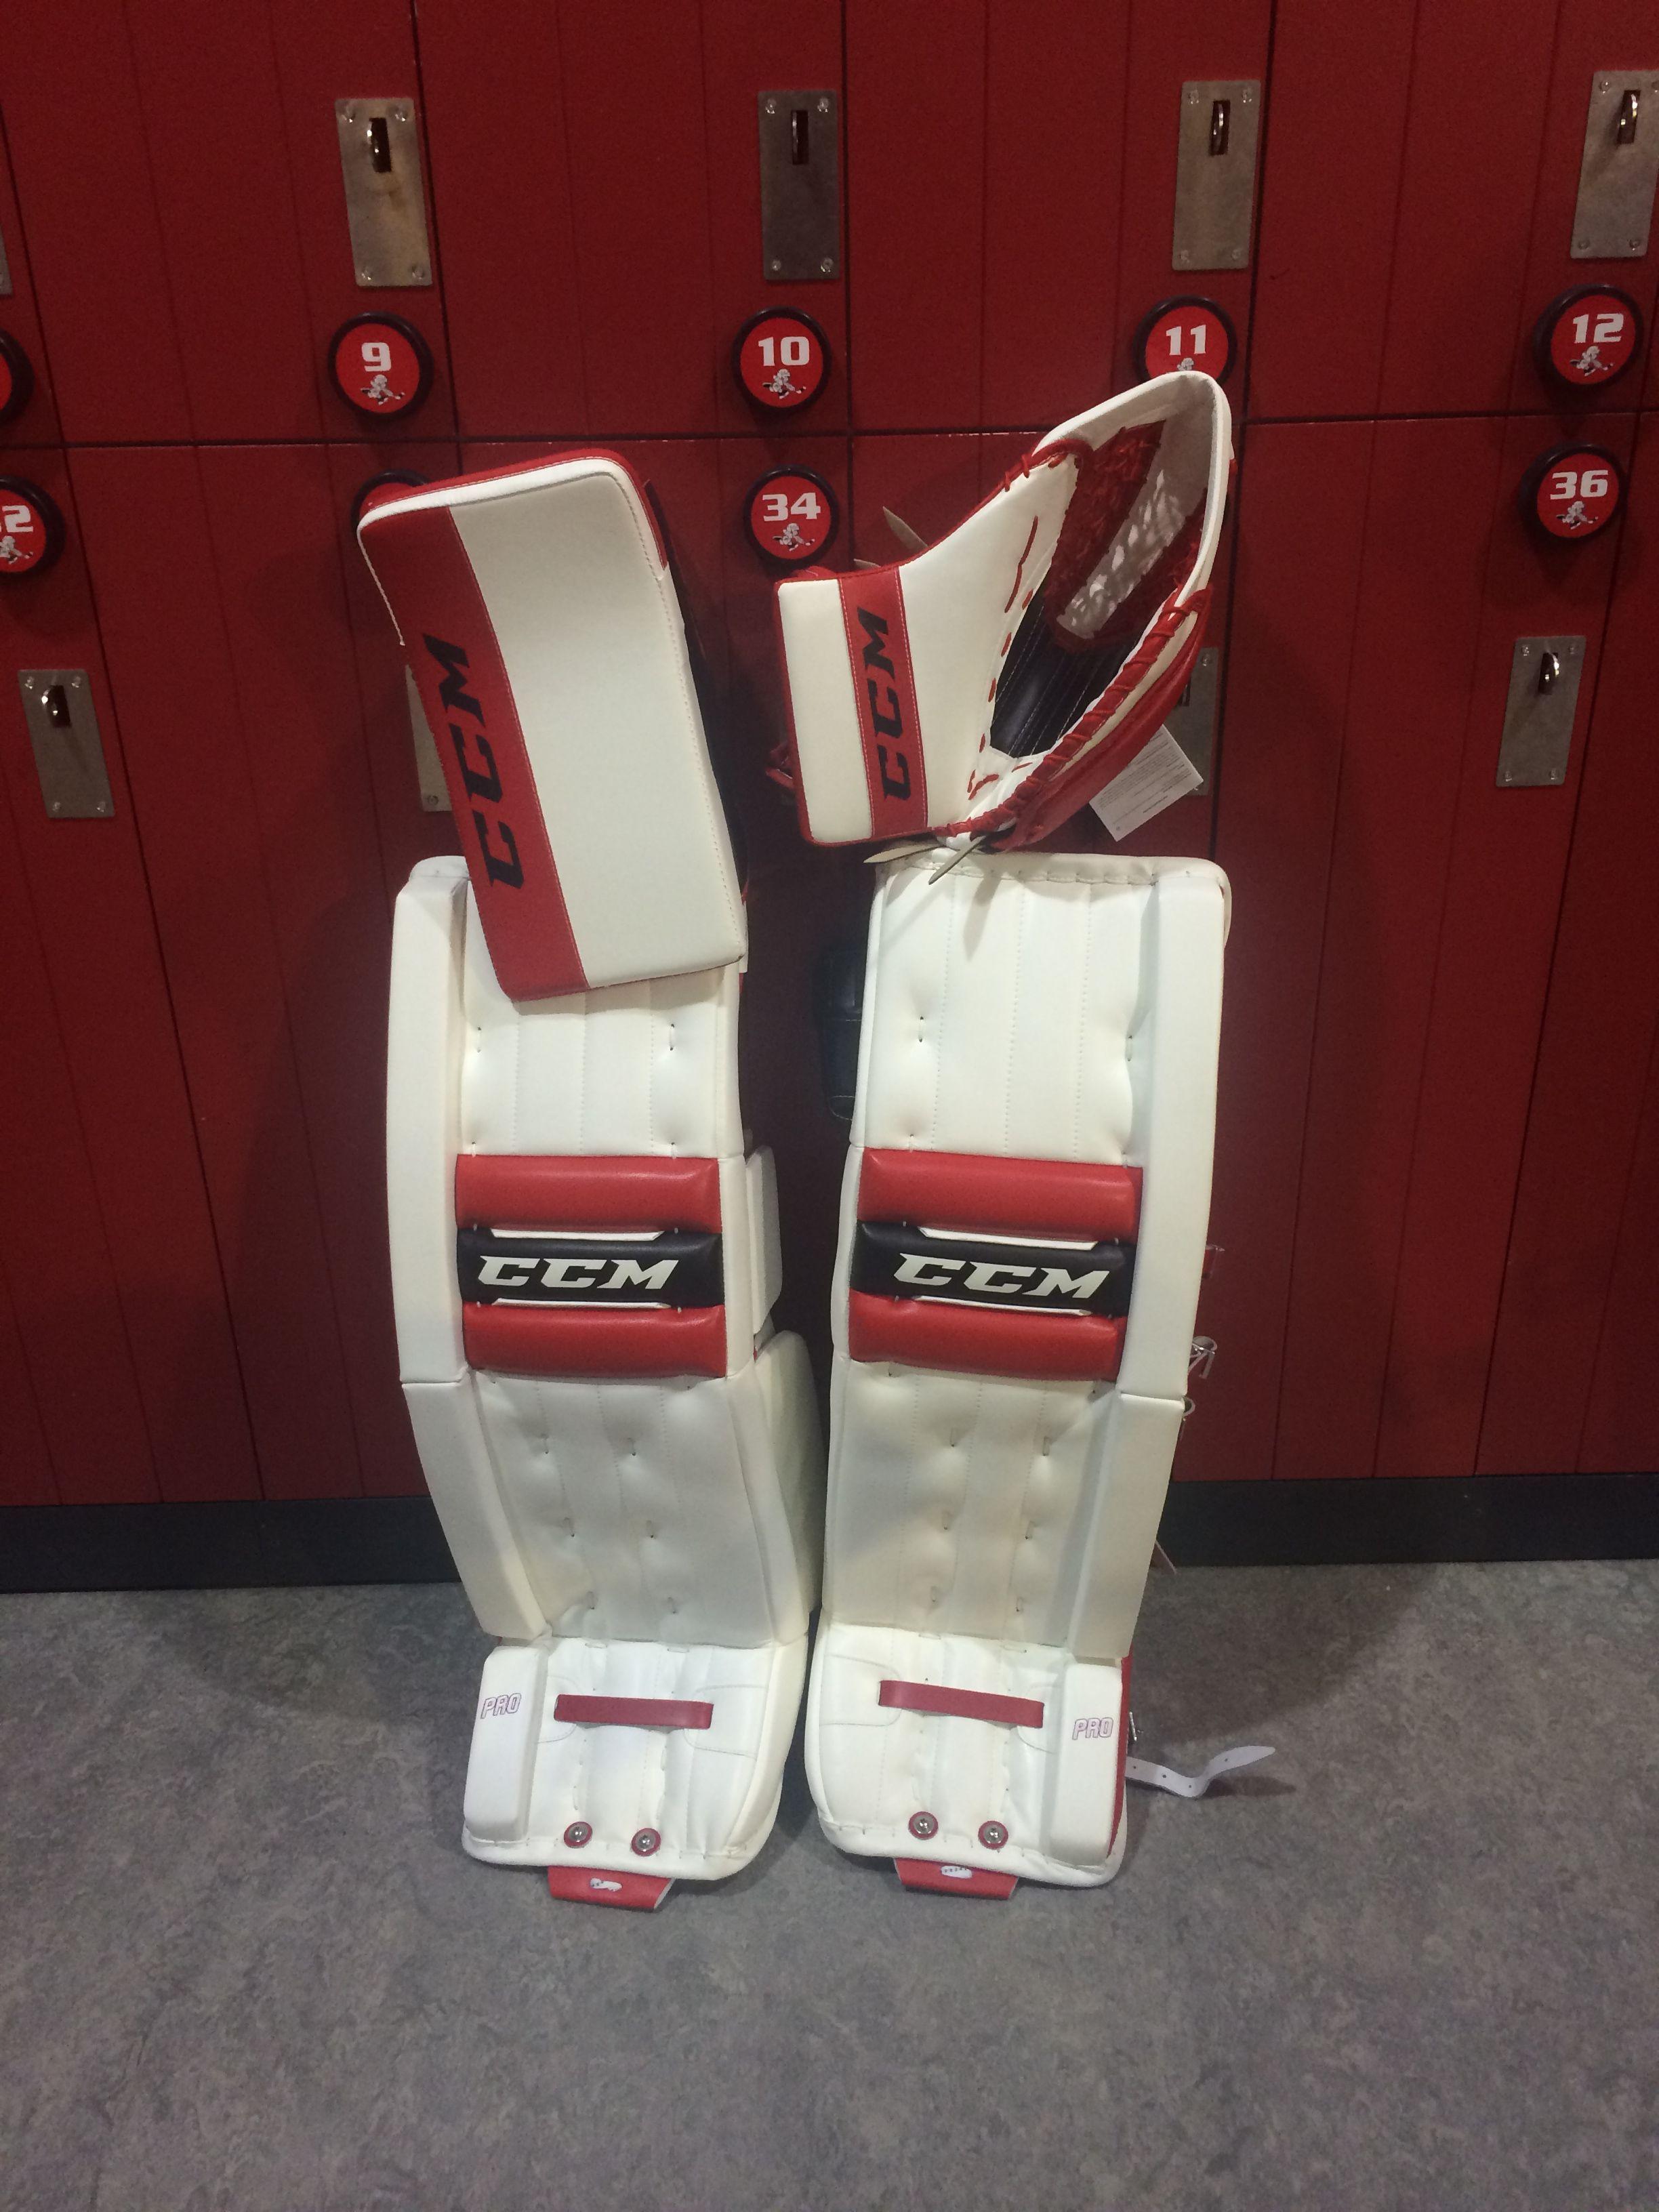 41bdb2abfc8 CCM Retro Flex Pro custom goalie pads and gloves made for a customer. Custom  colors are White